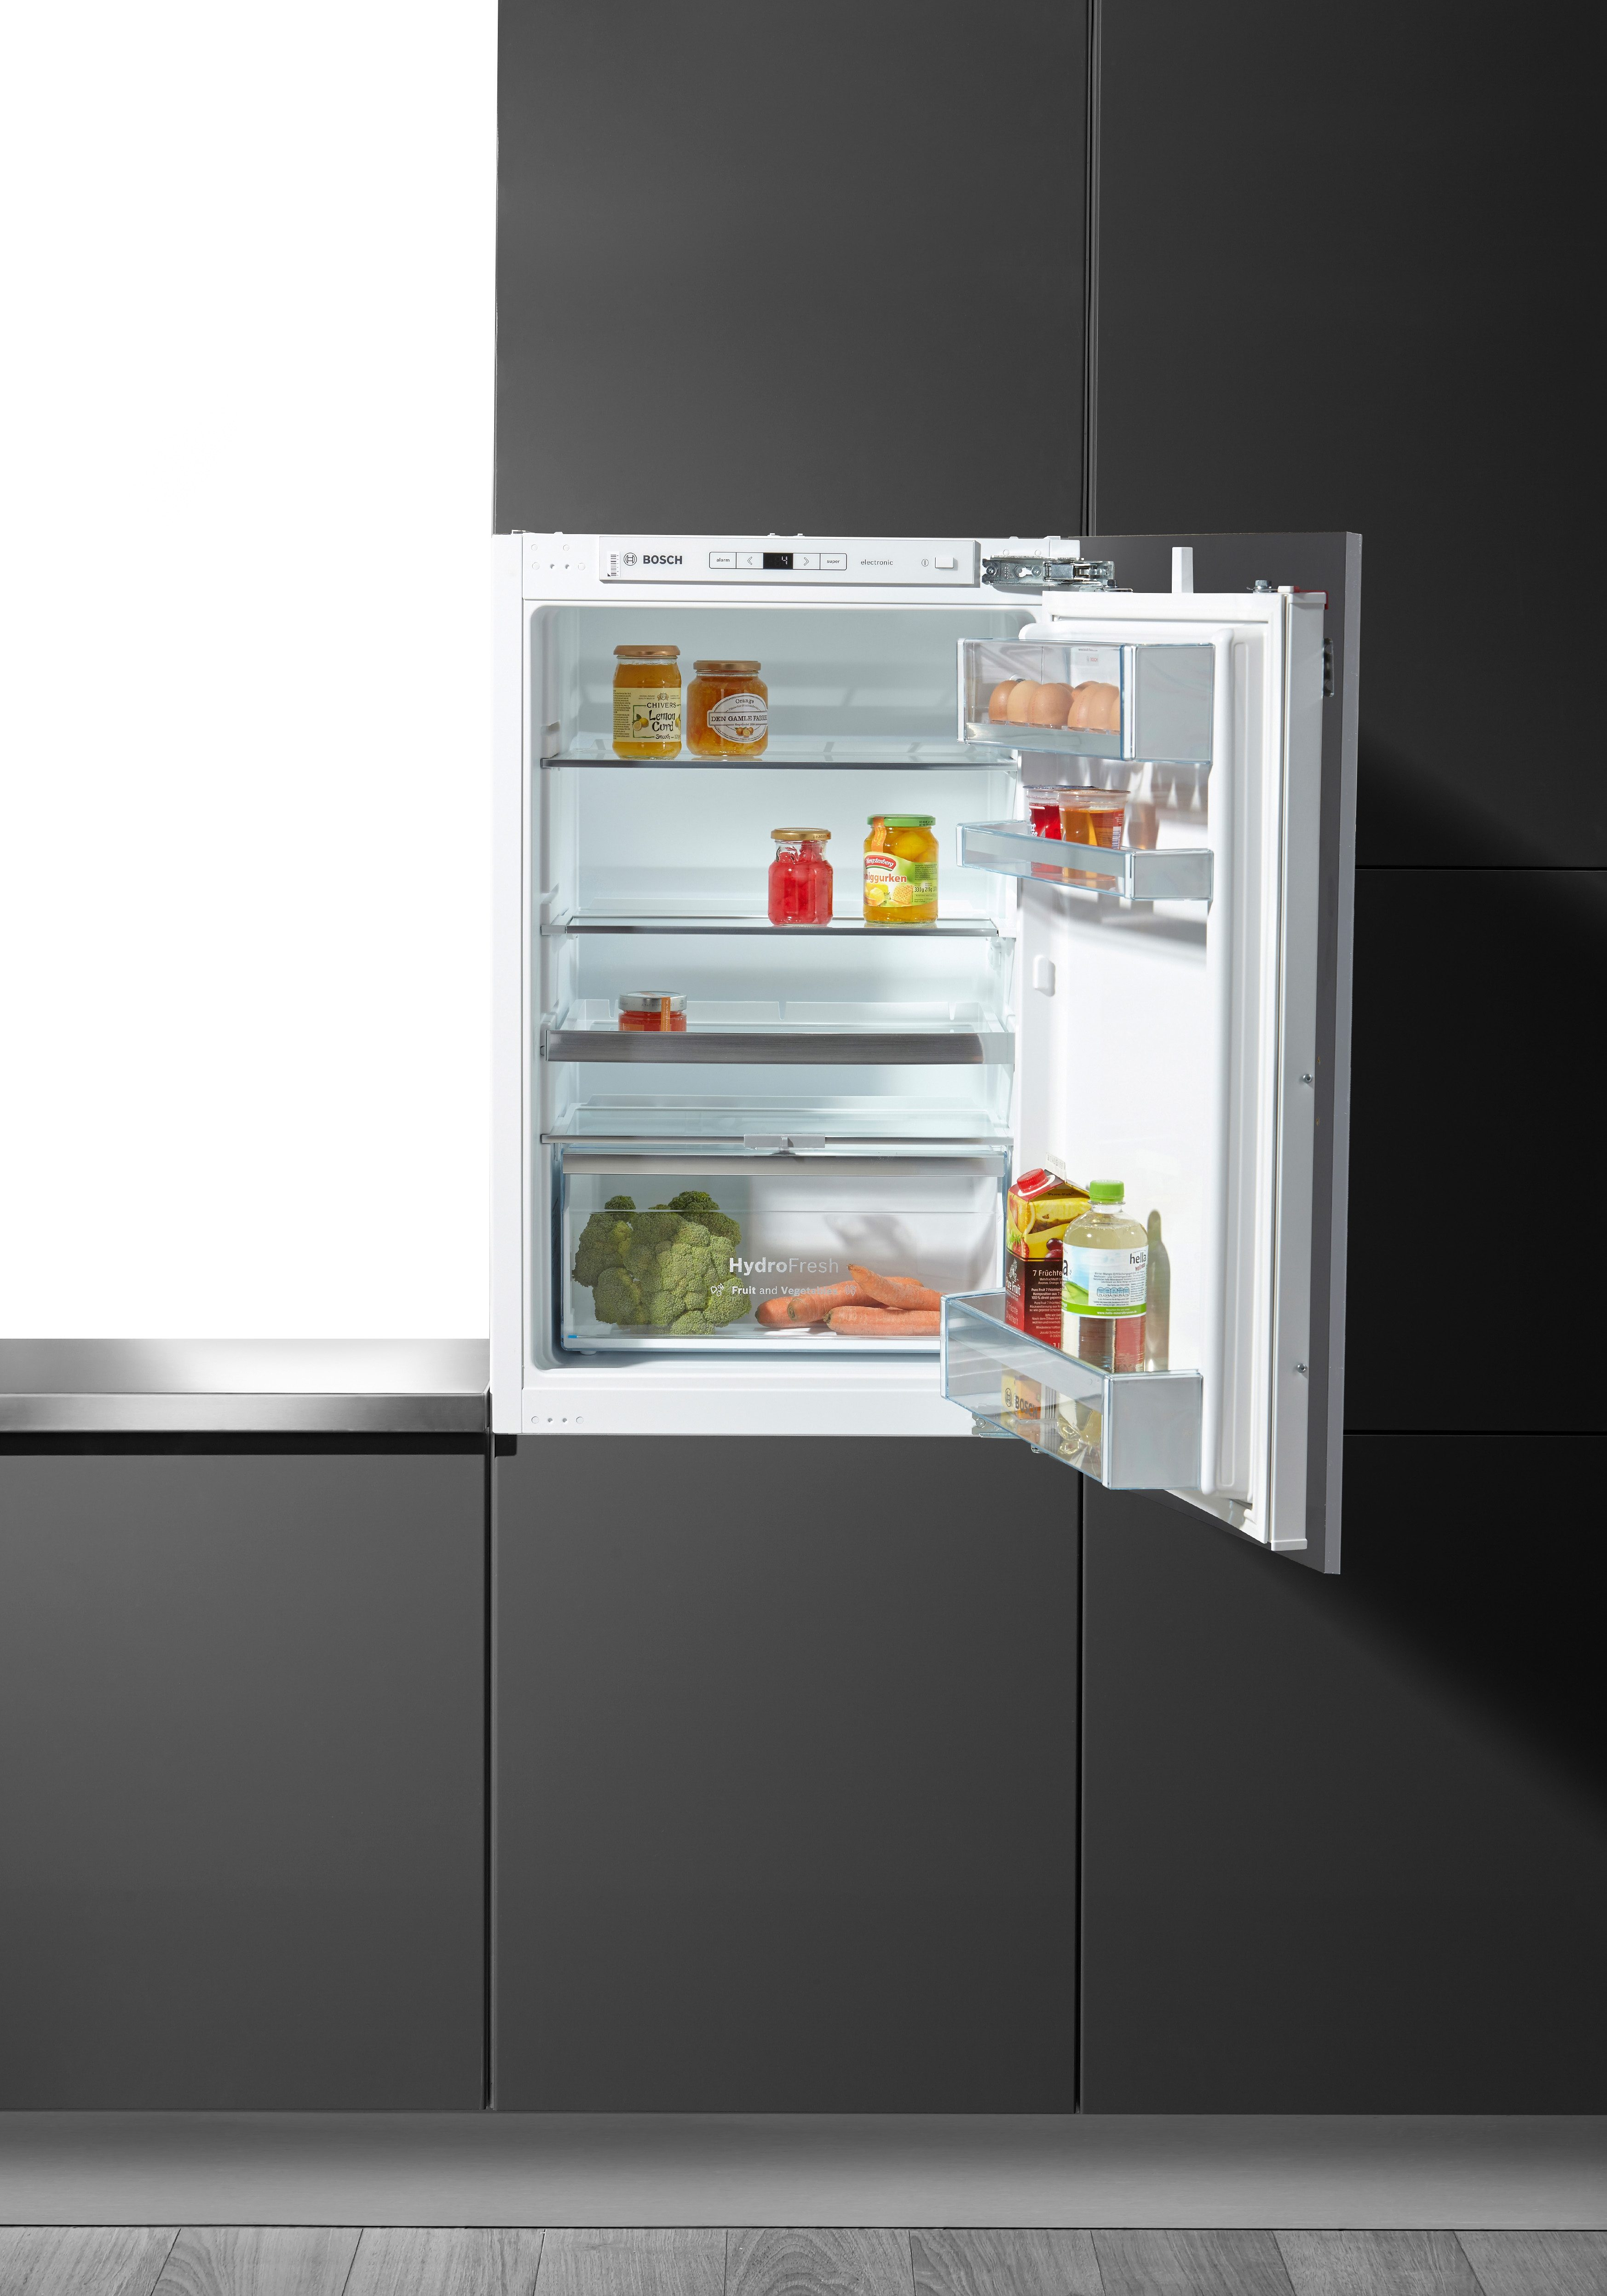 BOSCH Einbaukühlschrank KIR21AD40, 87,4 cm hoch, 55,8 cm breit, A+++, 88 cm hoch, integrierbar